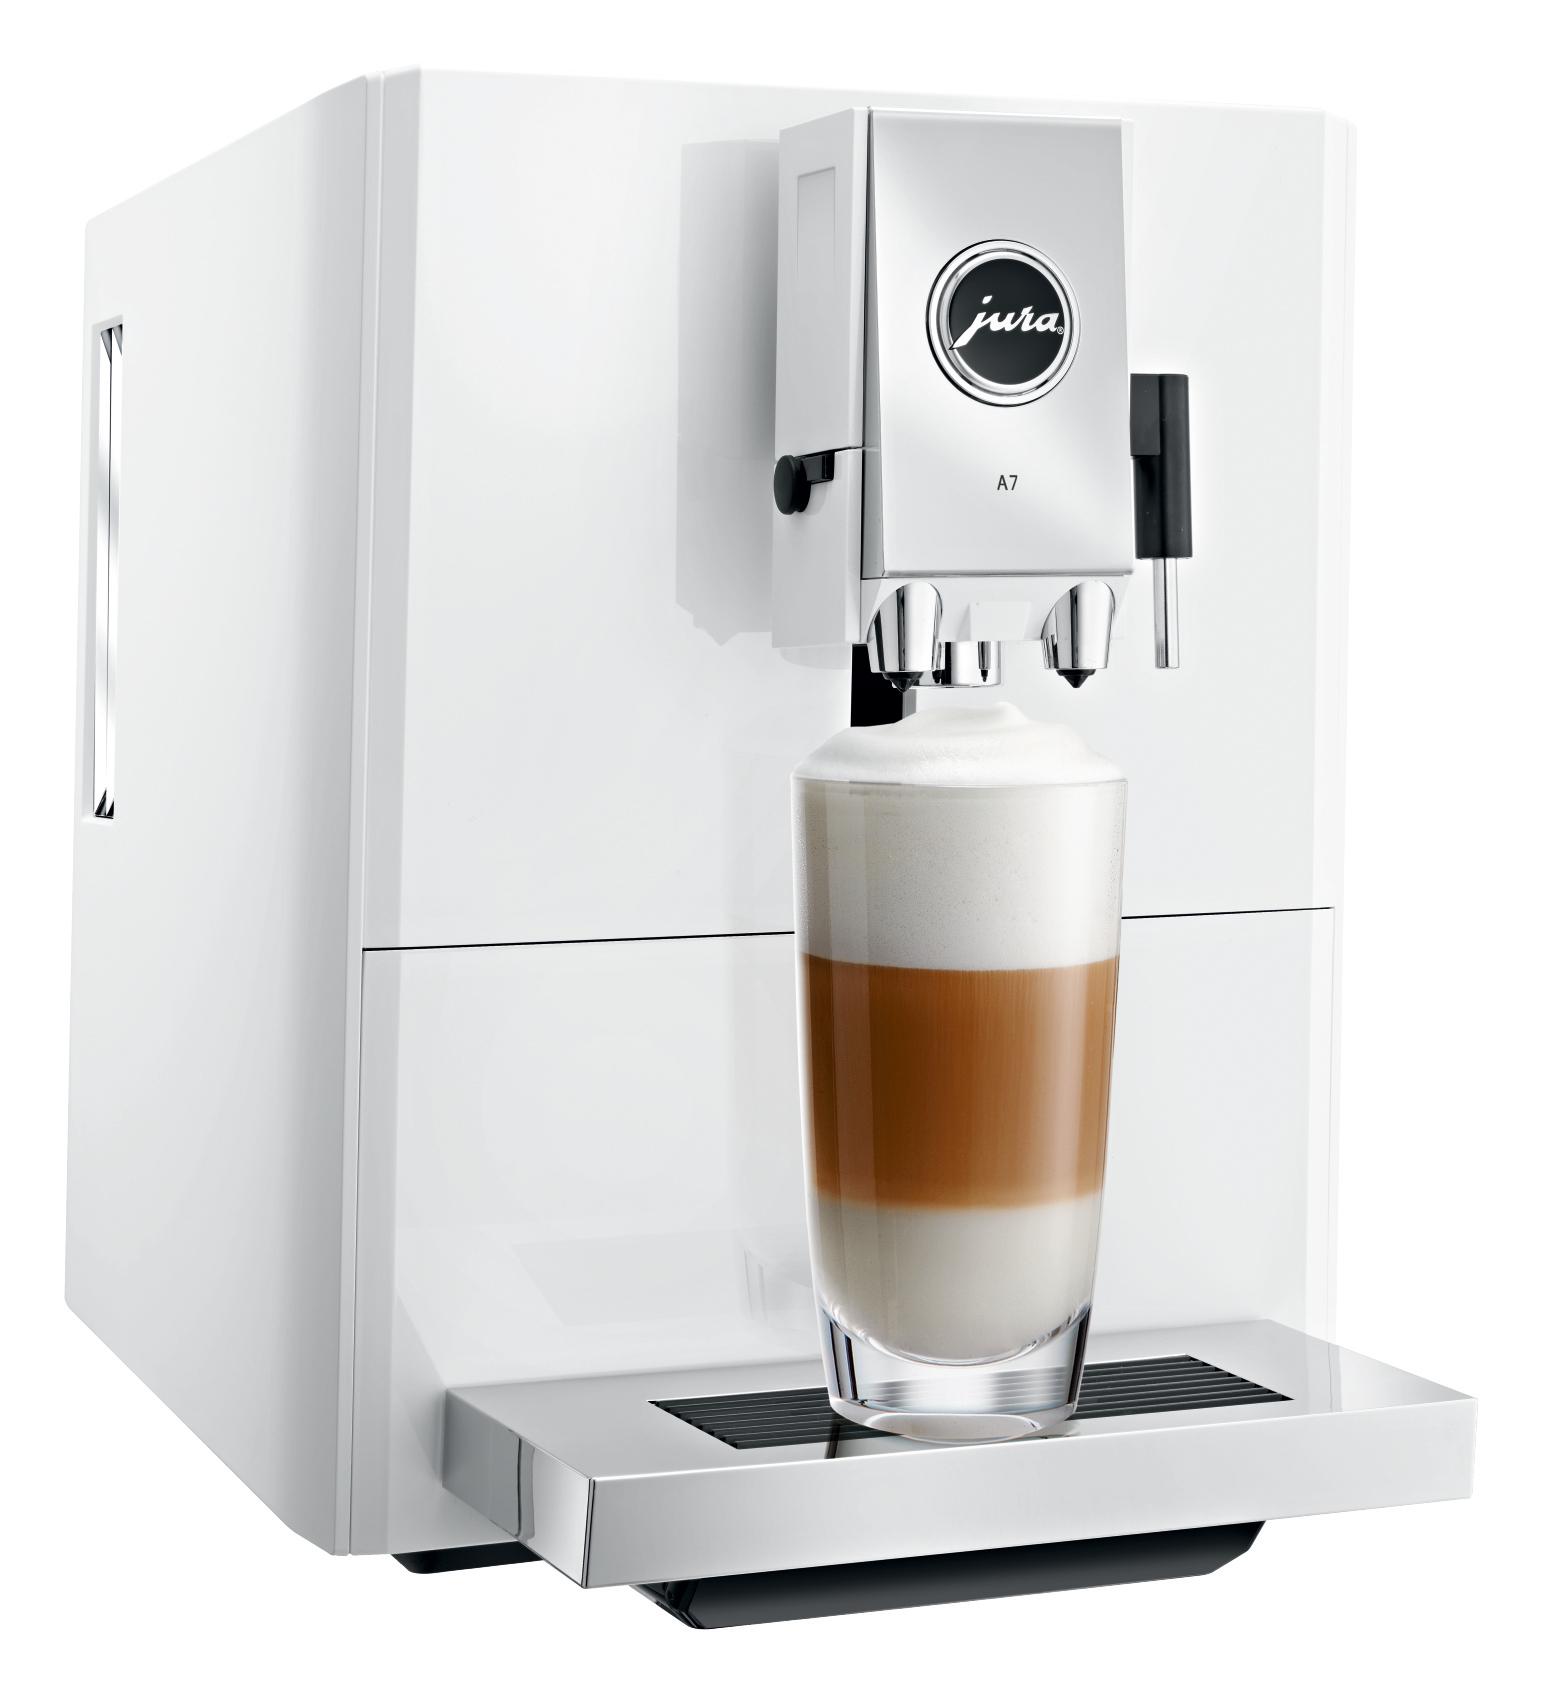 jura kaffeevollautomat a7. Black Bedroom Furniture Sets. Home Design Ideas